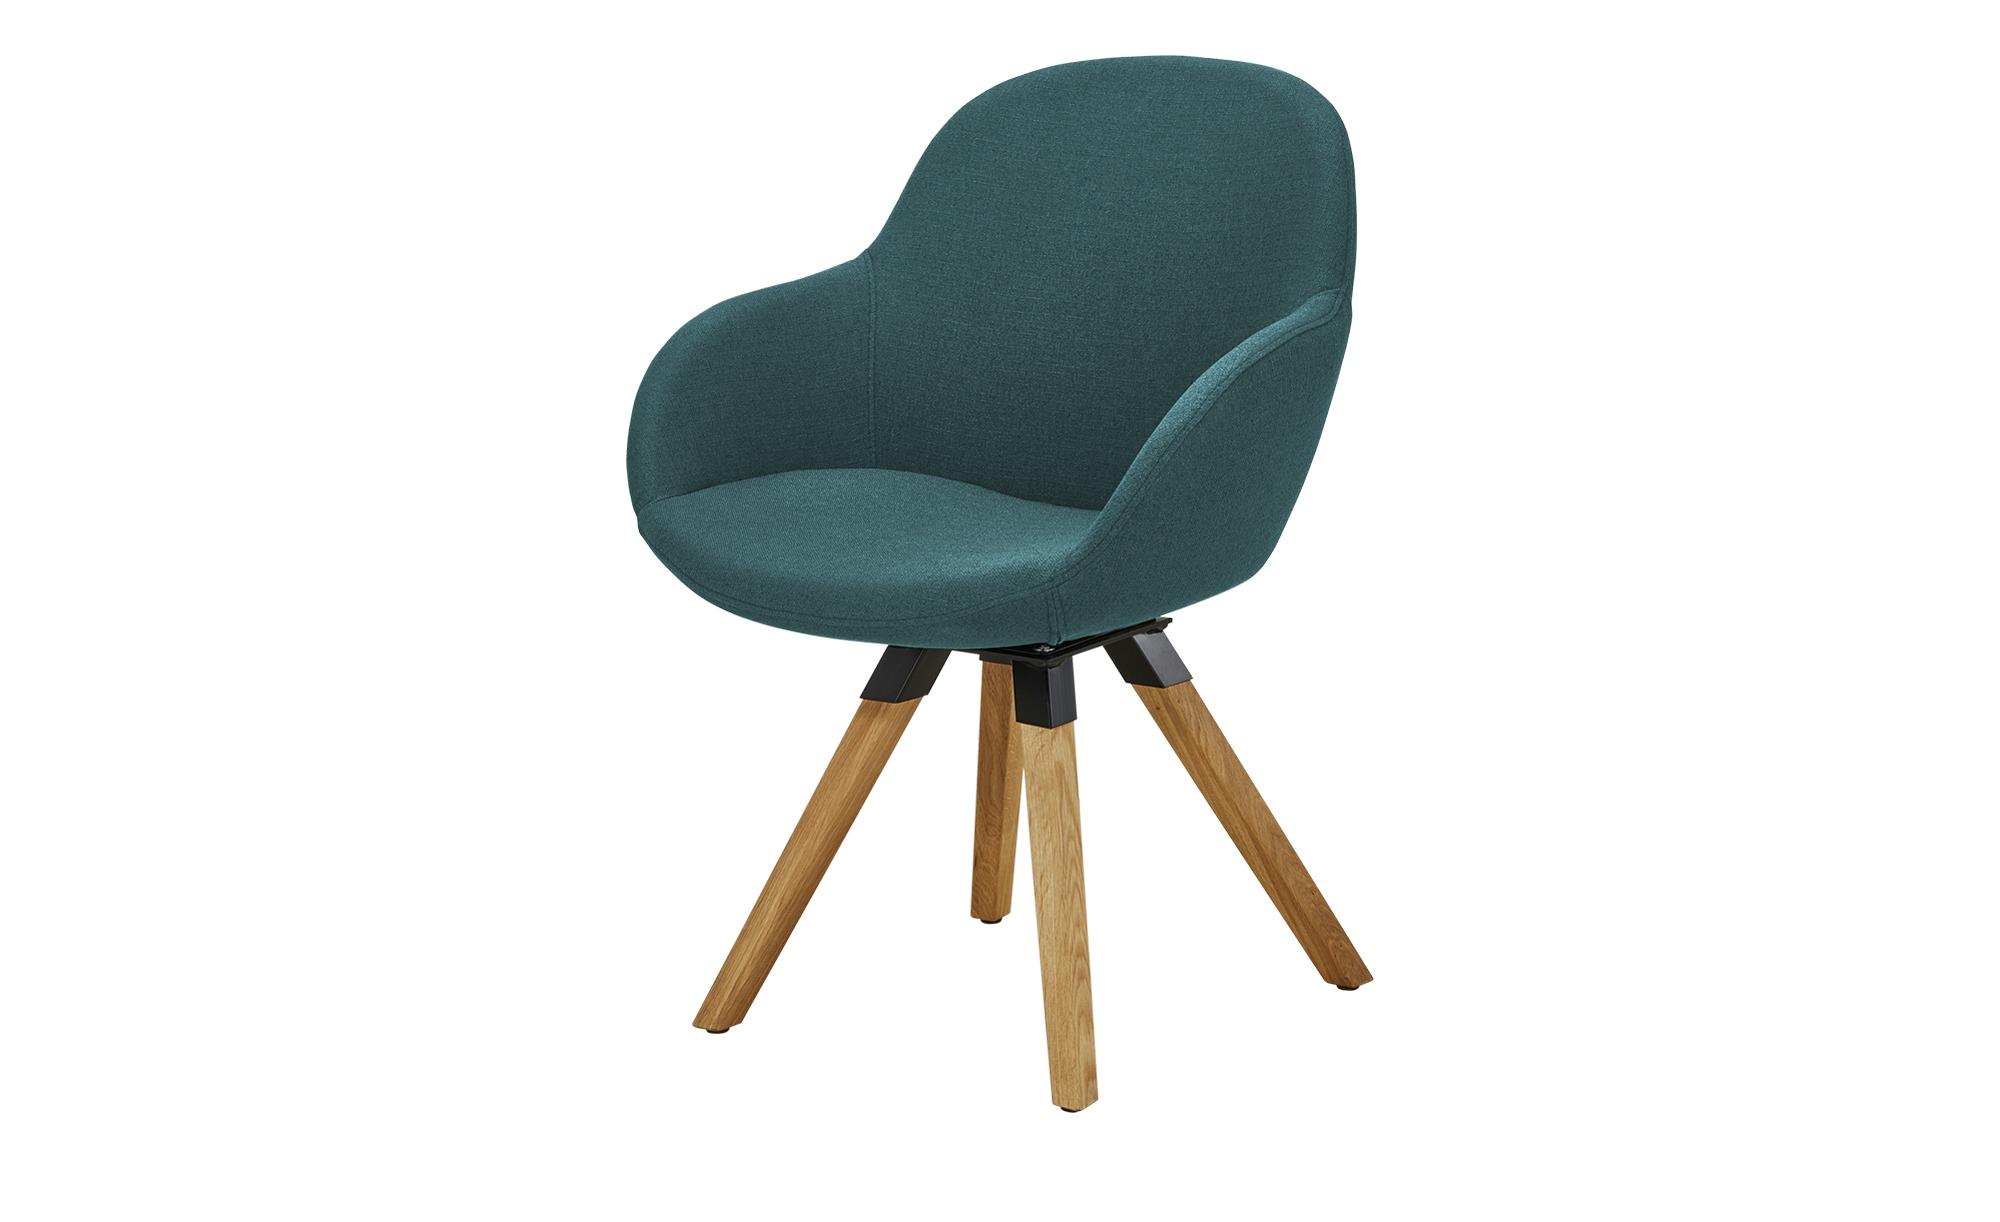 Sessel  Tom ¦ Maße (cm): B: 60 H: 83 T: 64 Stühle > Esszimmerstühle > Esszimmerstühle mit Armlehnen - Höffner